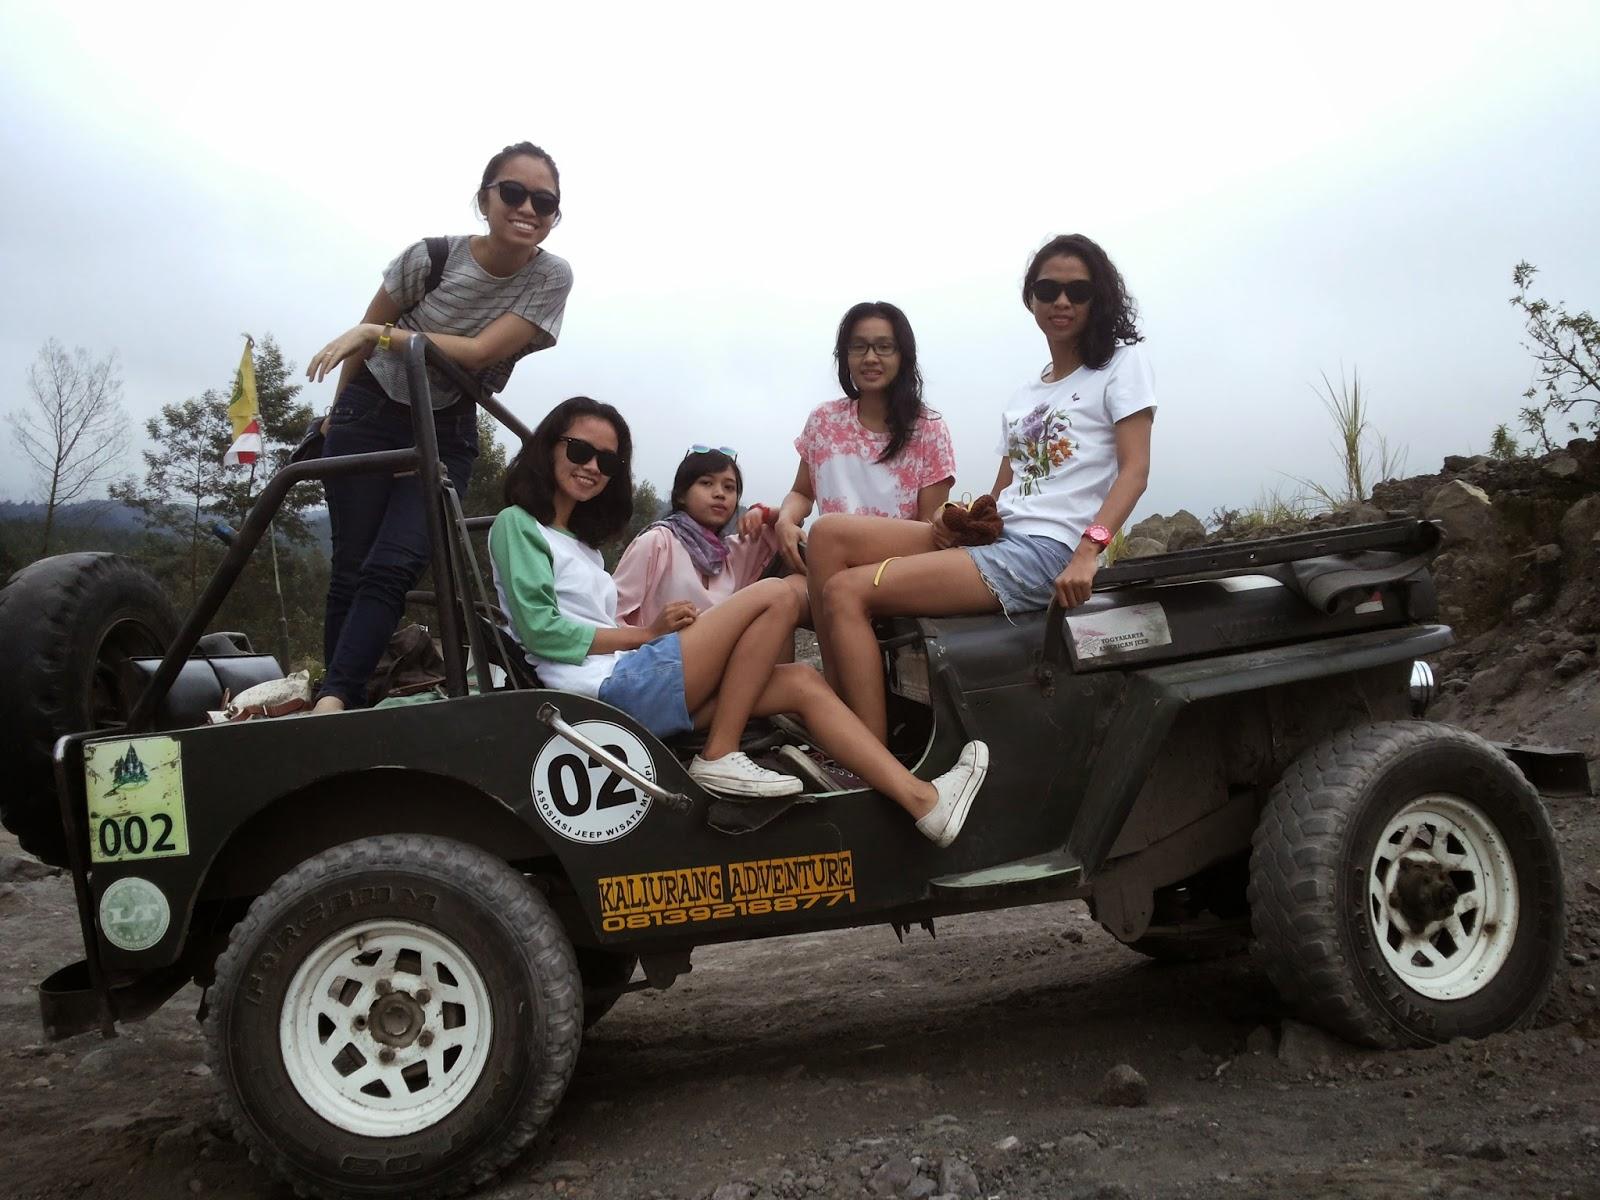 Feature Wisata Jeep Gunung Merapi Welcome